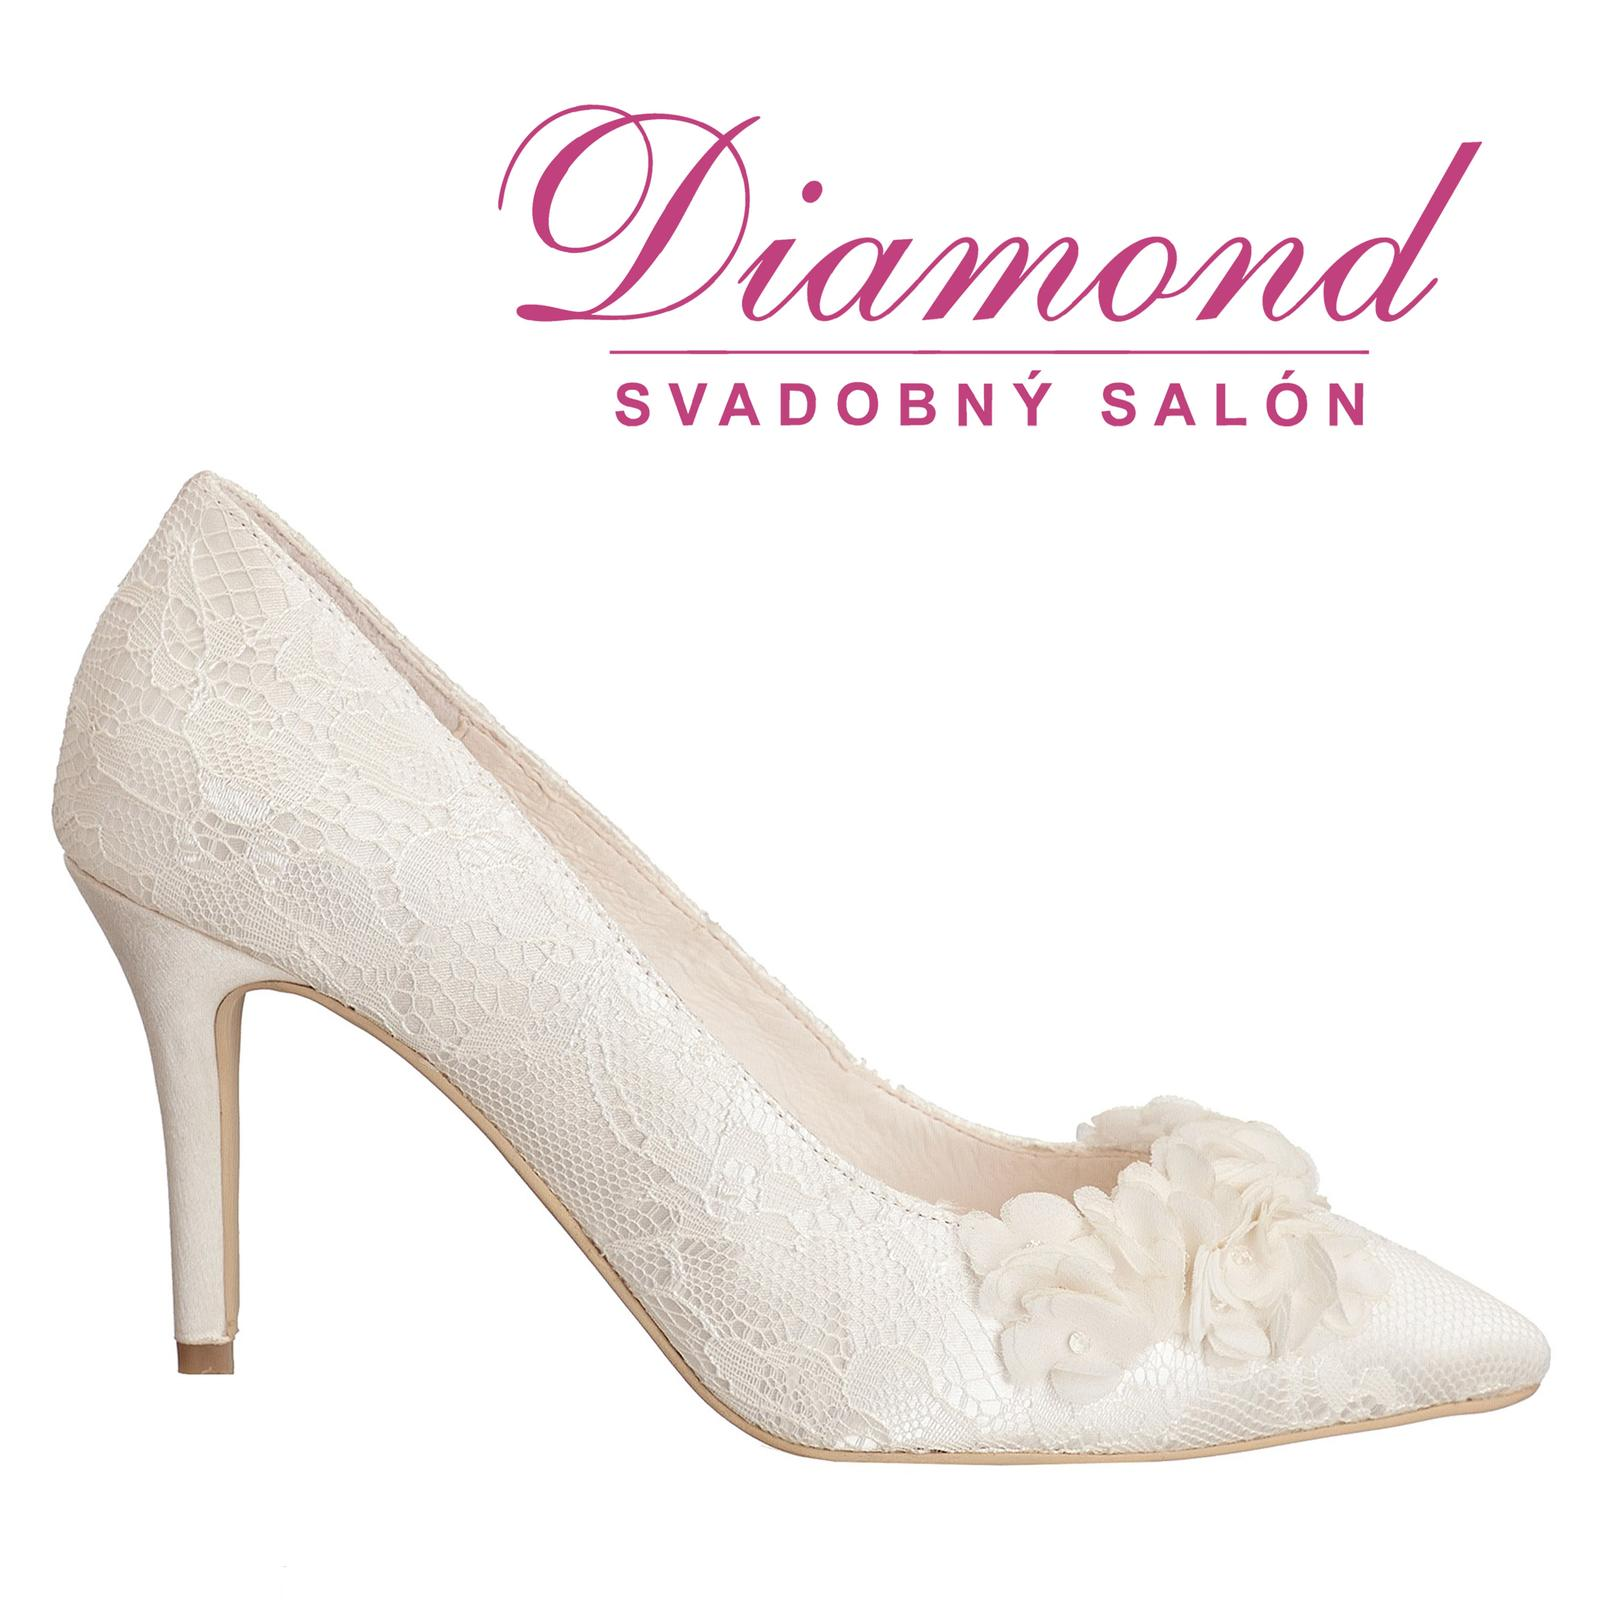 Svadobné topánky Lucia (6285) - Obrázok č. 1